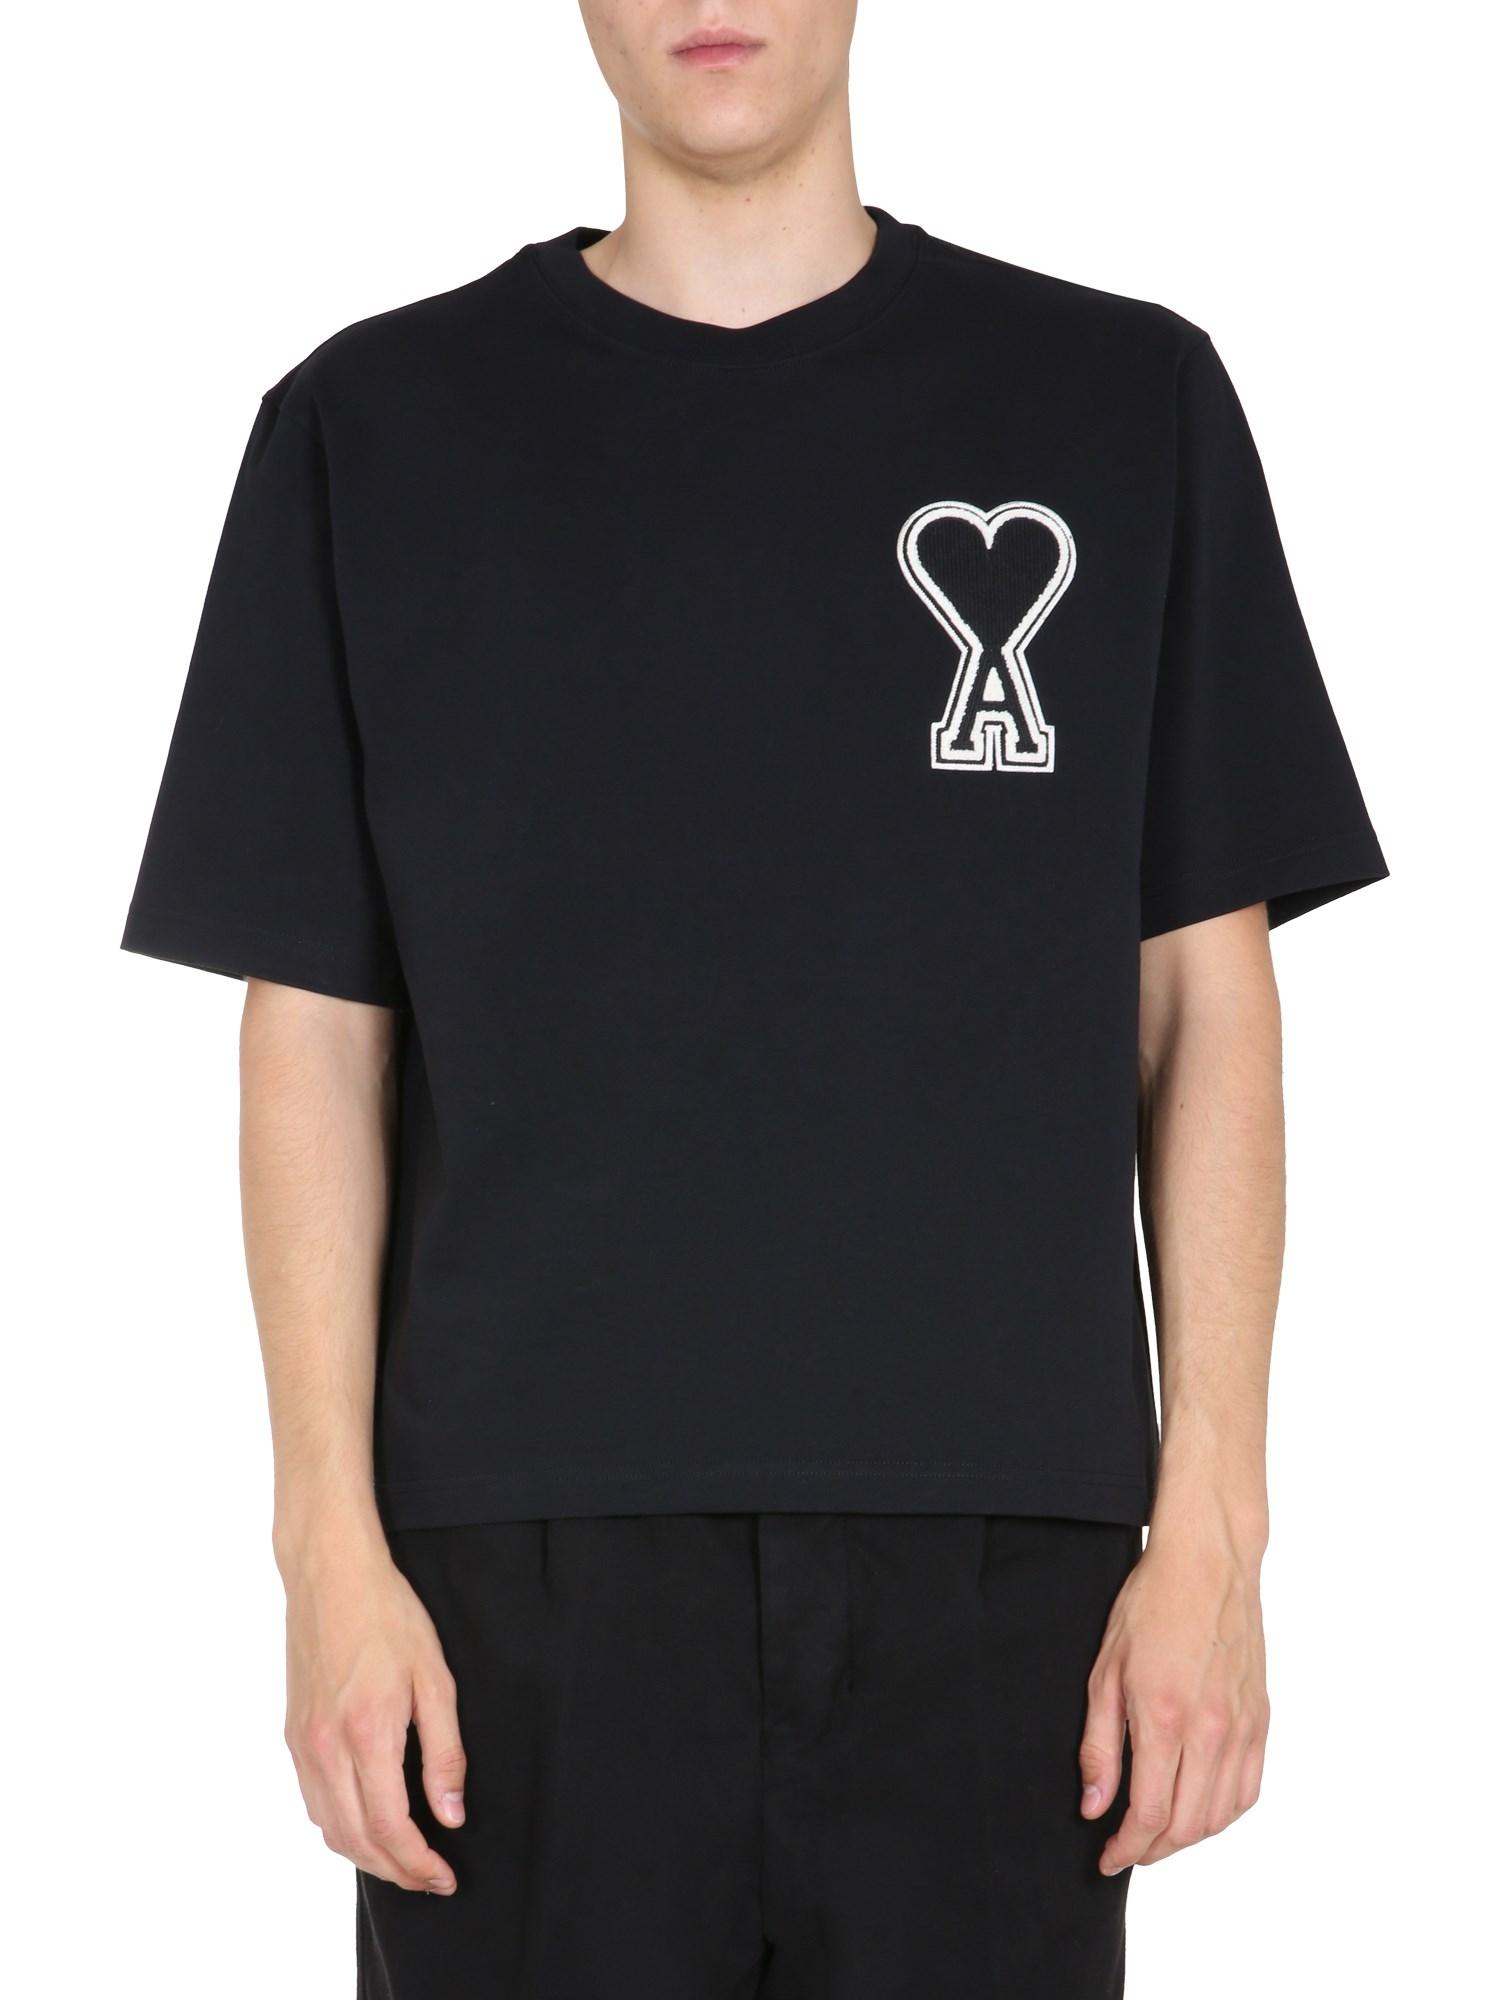 Ami Alexandre Mattiussi Round Neck T-shirt In Black